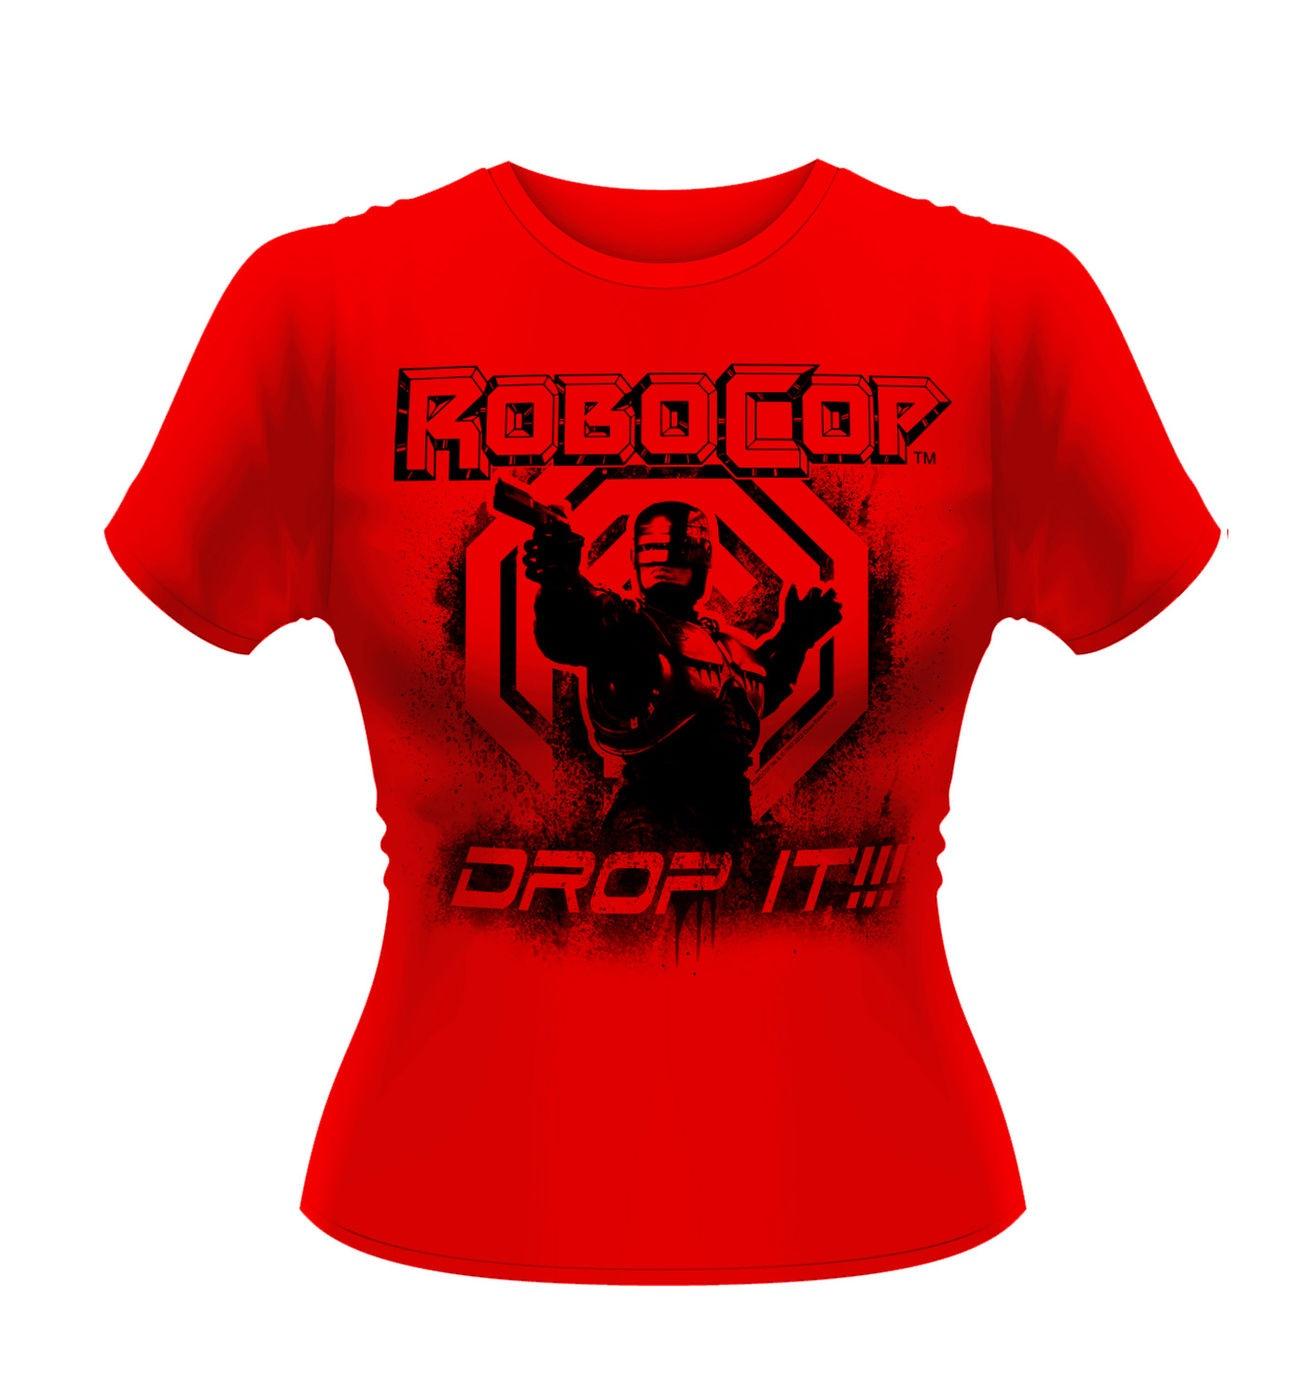 OFFICIAL Robocop Drop It women's fitted t-shirt